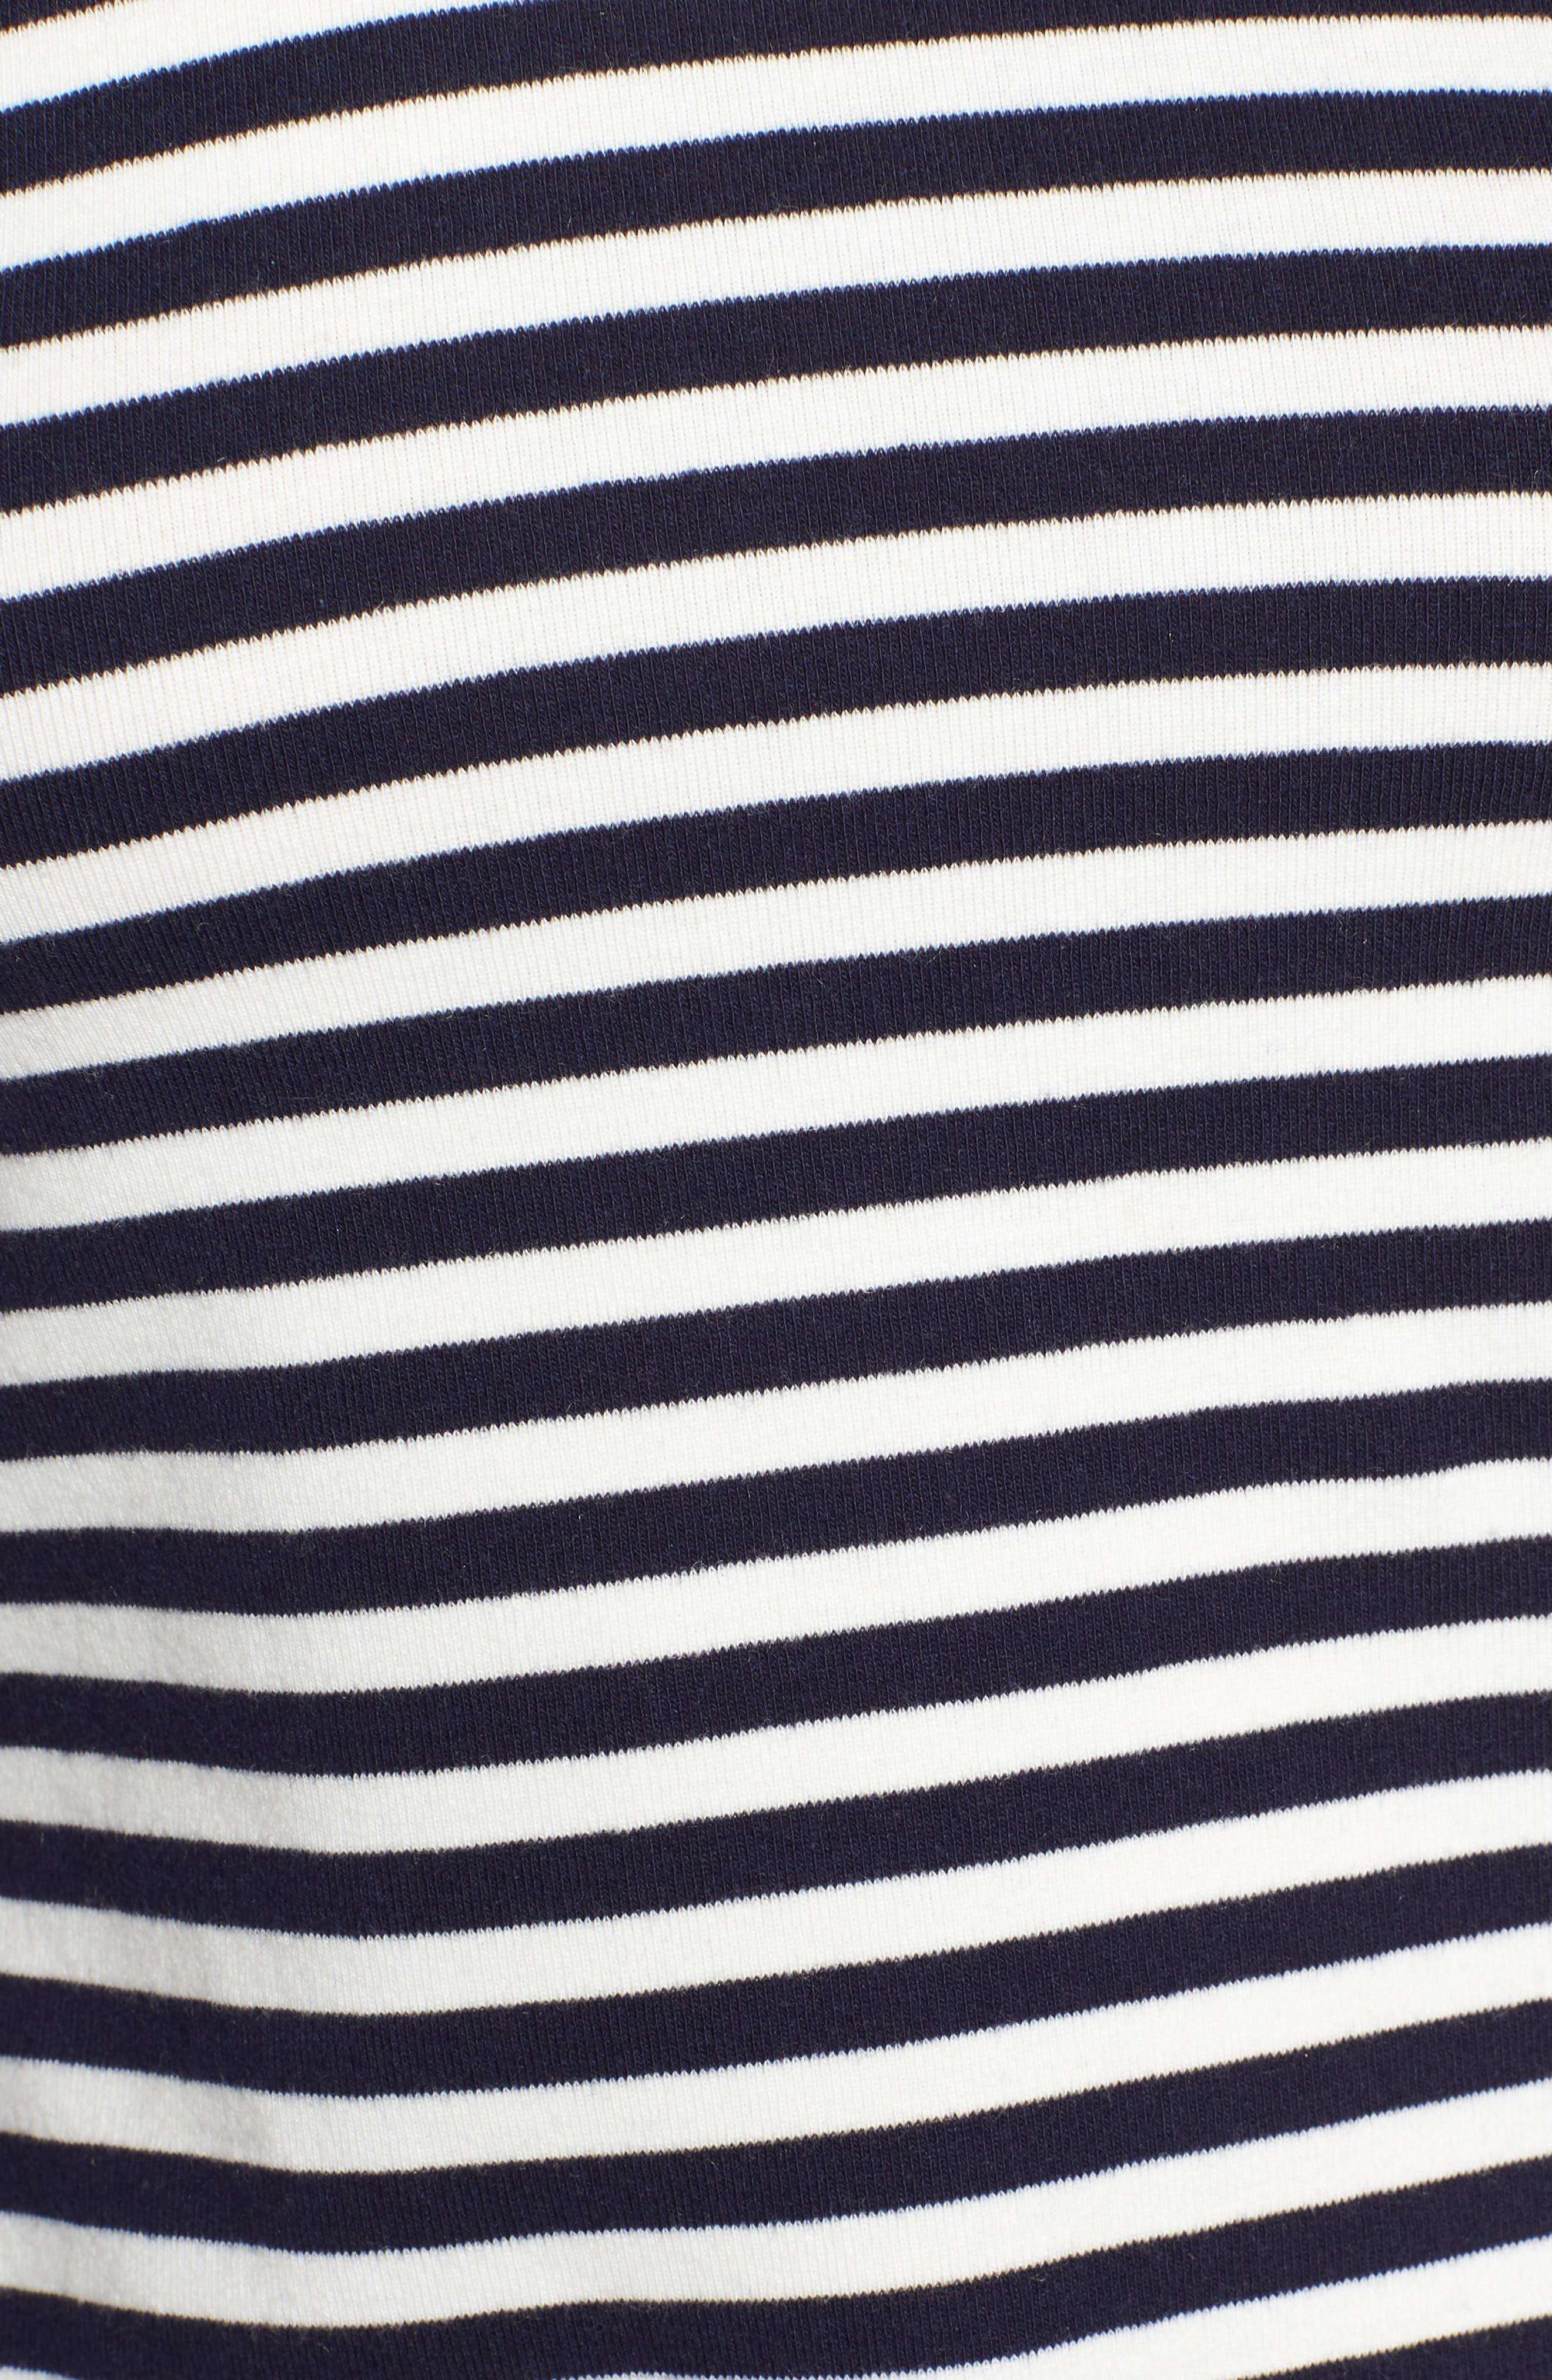 Stripe Tee,                             Alternate thumbnail 6, color,                             Navy/ White